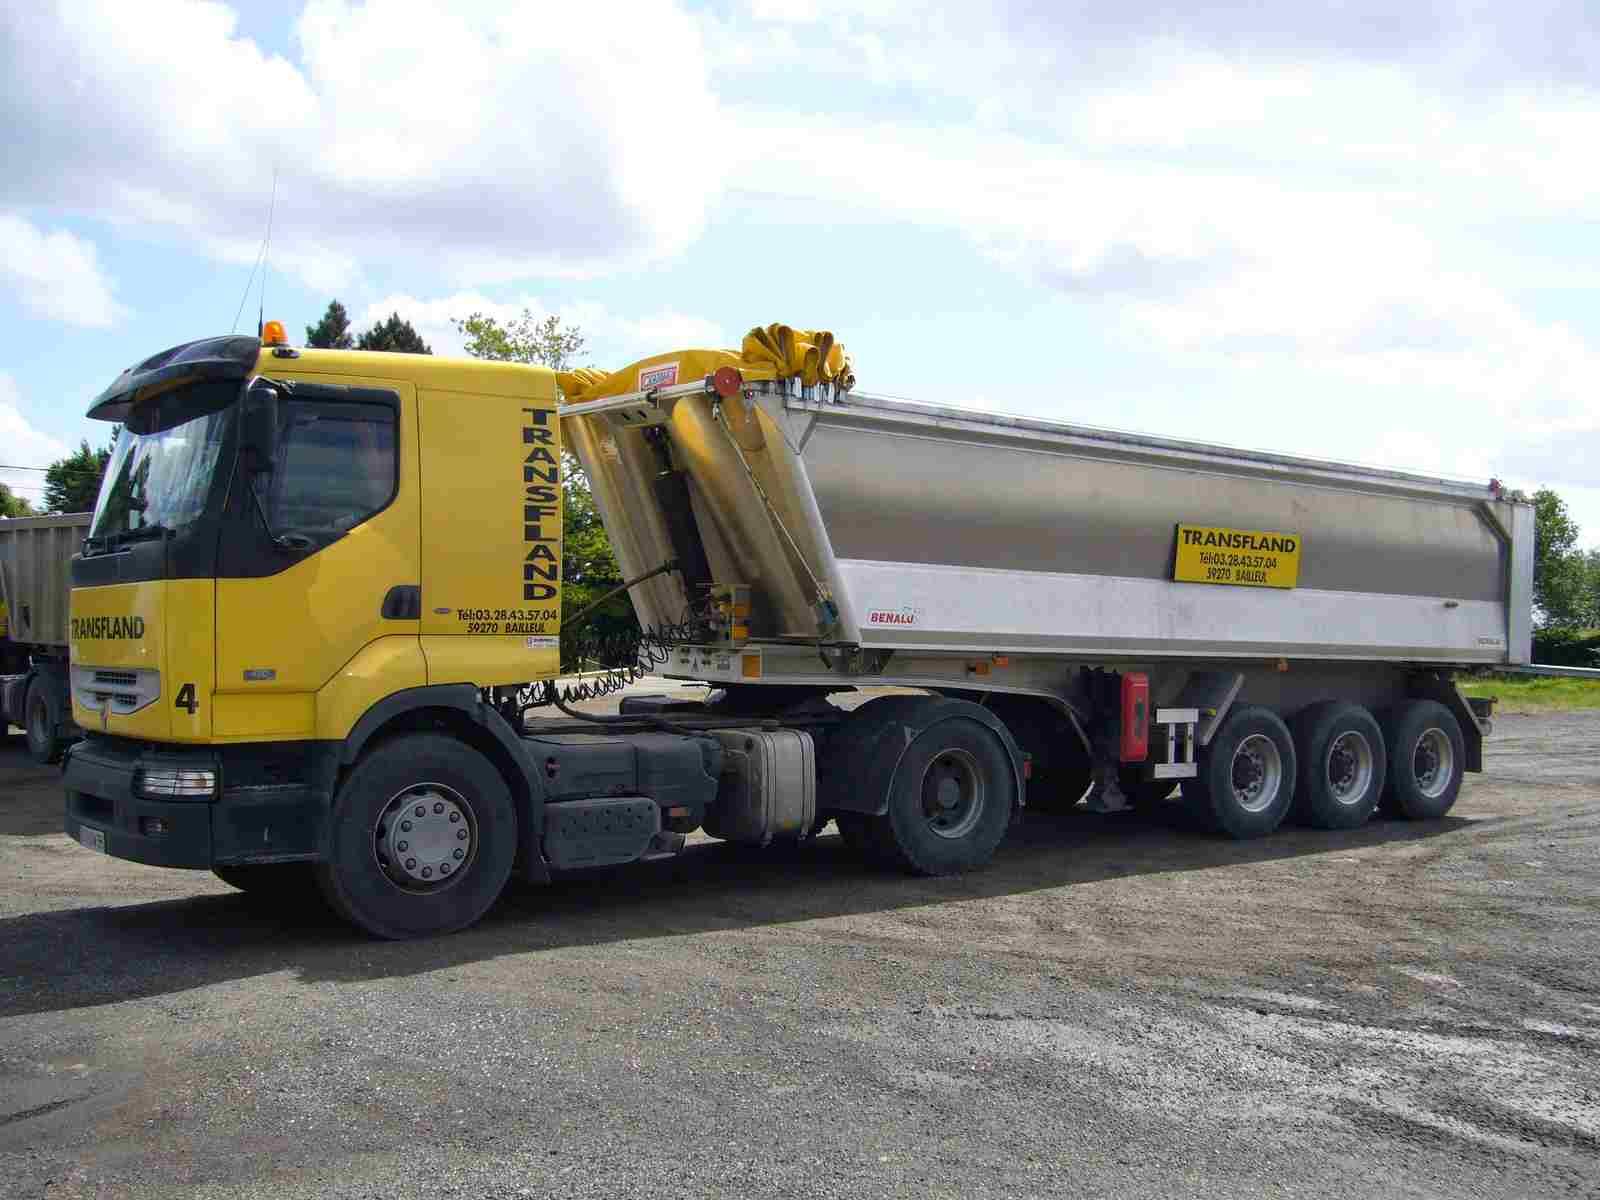 Transfland - Transport matériaux Bailleul - Tracteur